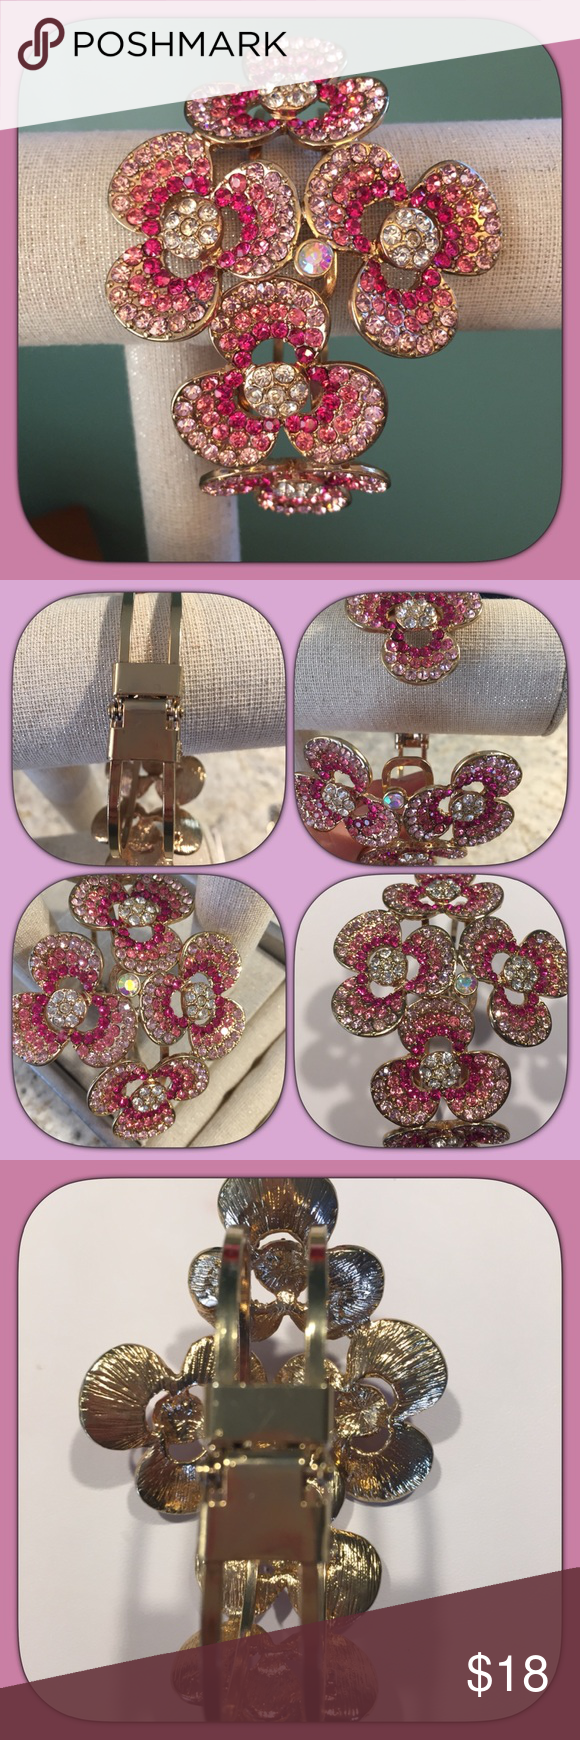 "Bracelet Cute cuff light pink/hot pink/crystal beaded bracelet. Flower design with Gold tones, 3"" height, 5"" across. Jewelry Bracelets"